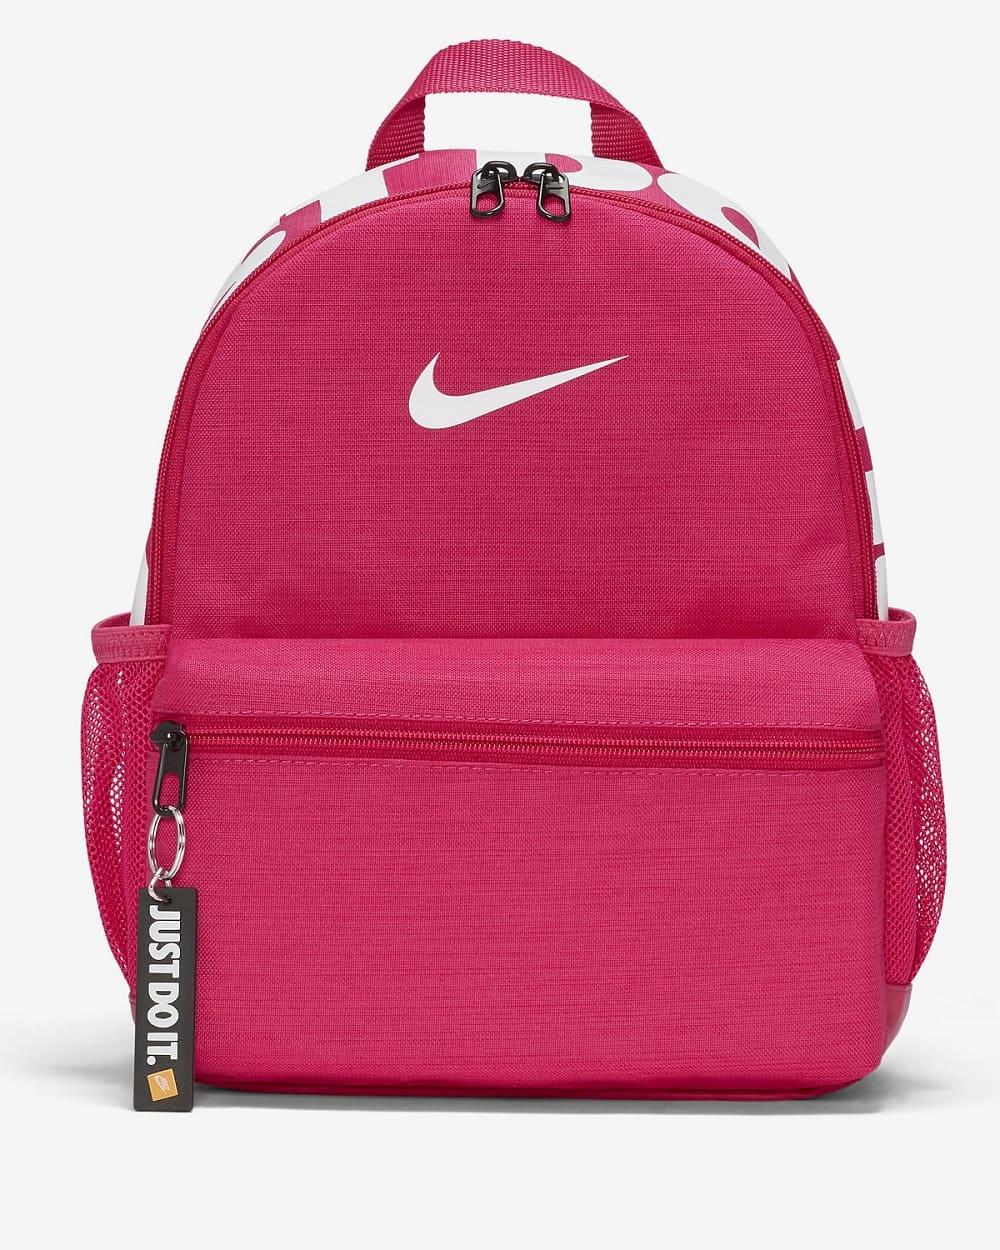 Nike Brasilia JDI Kids´ Backpack Fireberry/White -